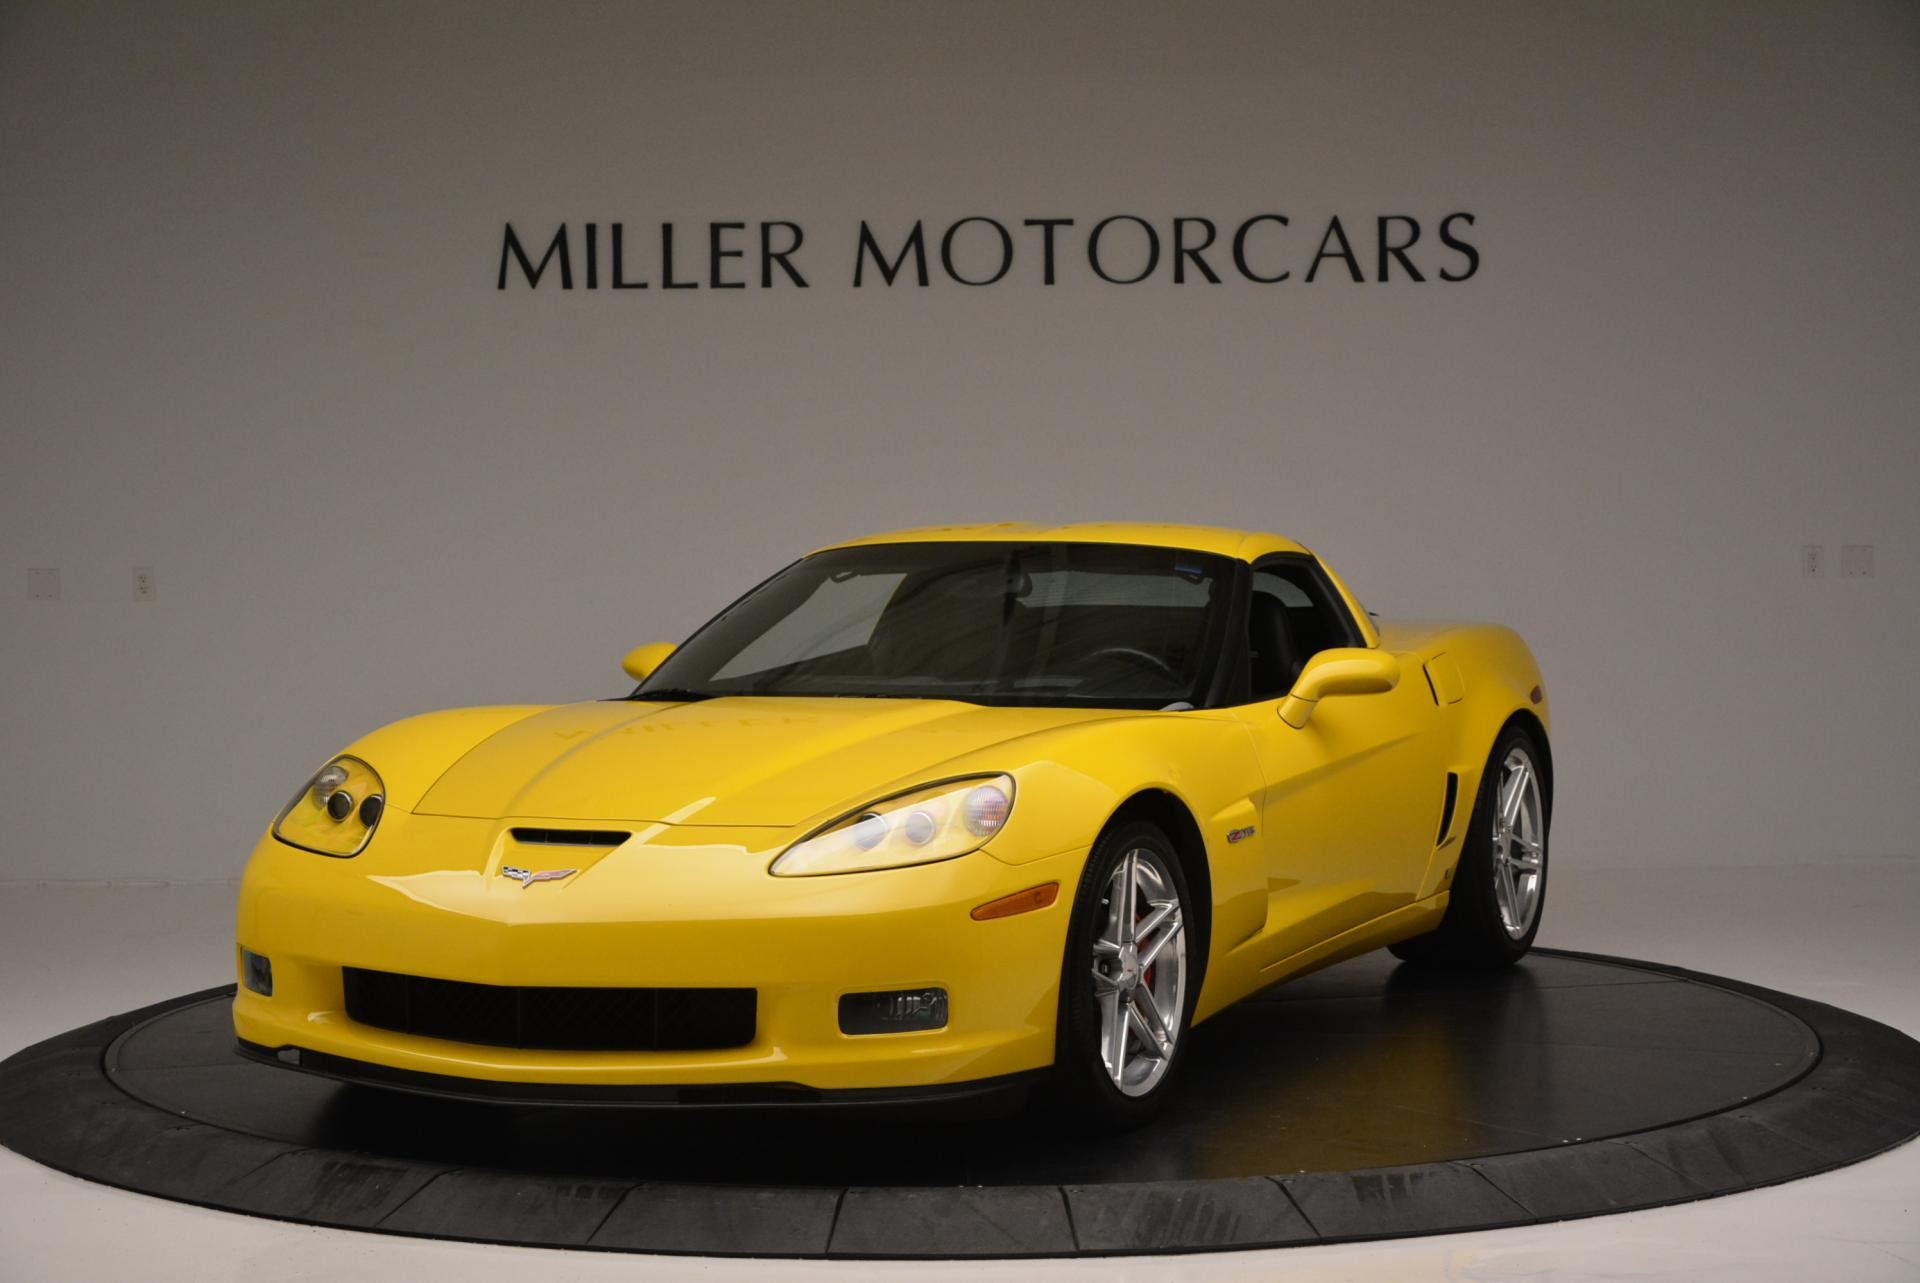 Used 2006 Chevrolet Corvette Z06 Hardtop For Sale In Greenwich, CT. Alfa Romeo of Greenwich, 7085 530_p2